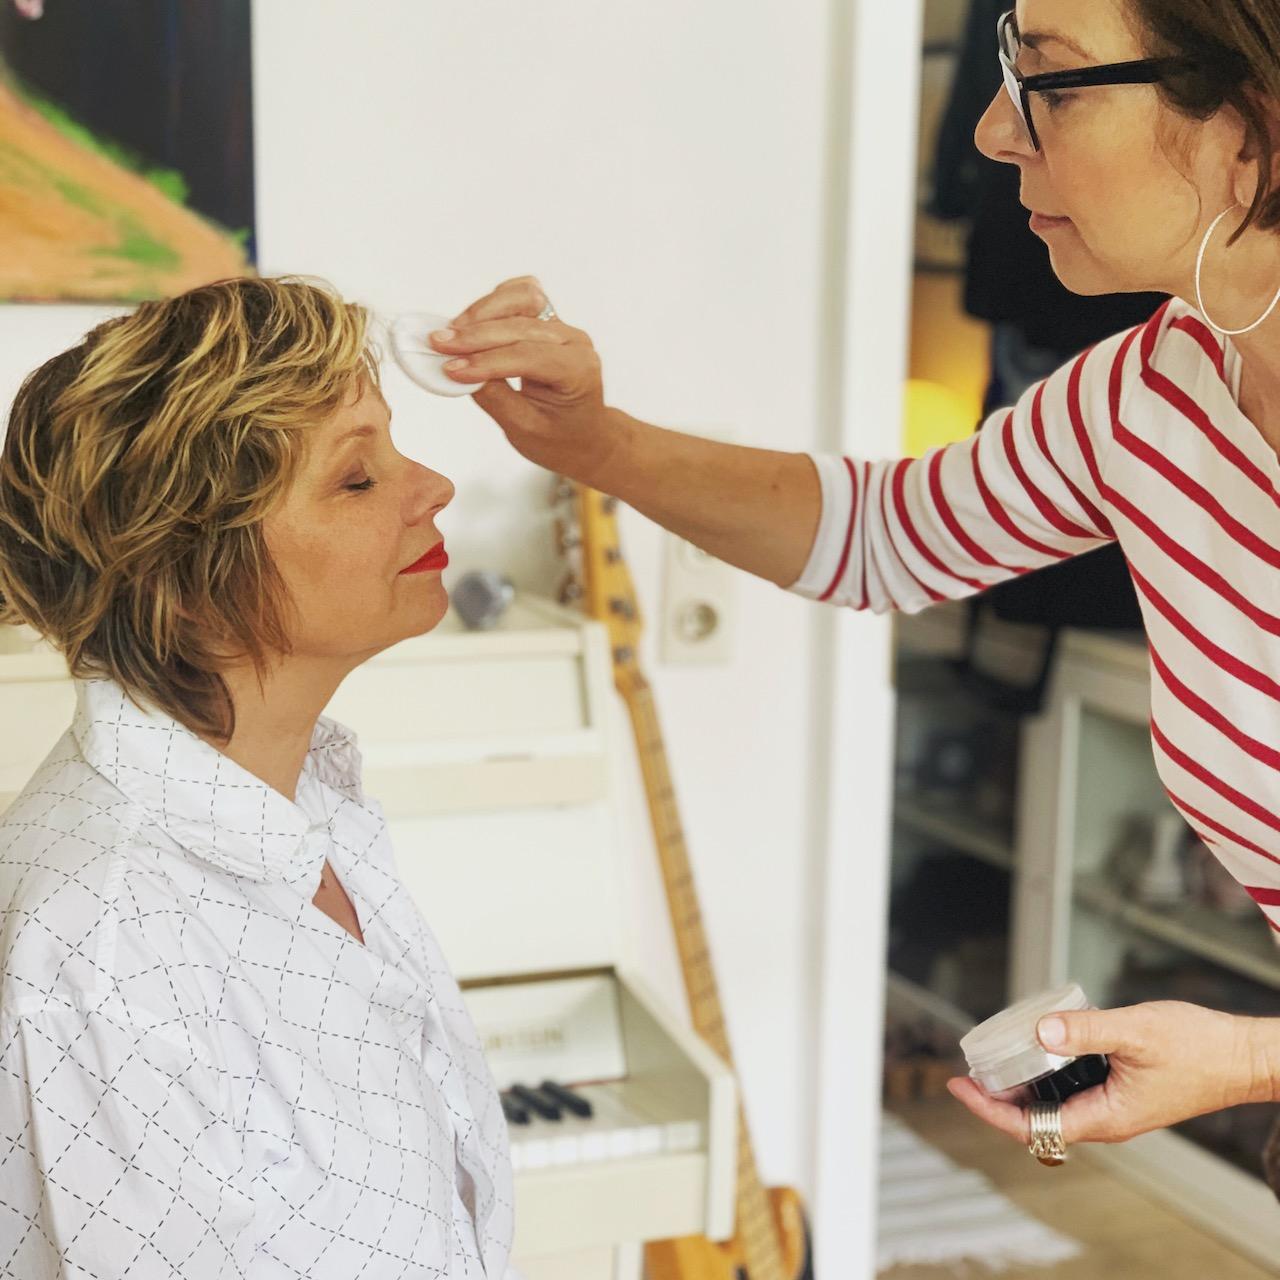 Martina pudert Dagmar die Nase Foto: Susanne Ackstaller